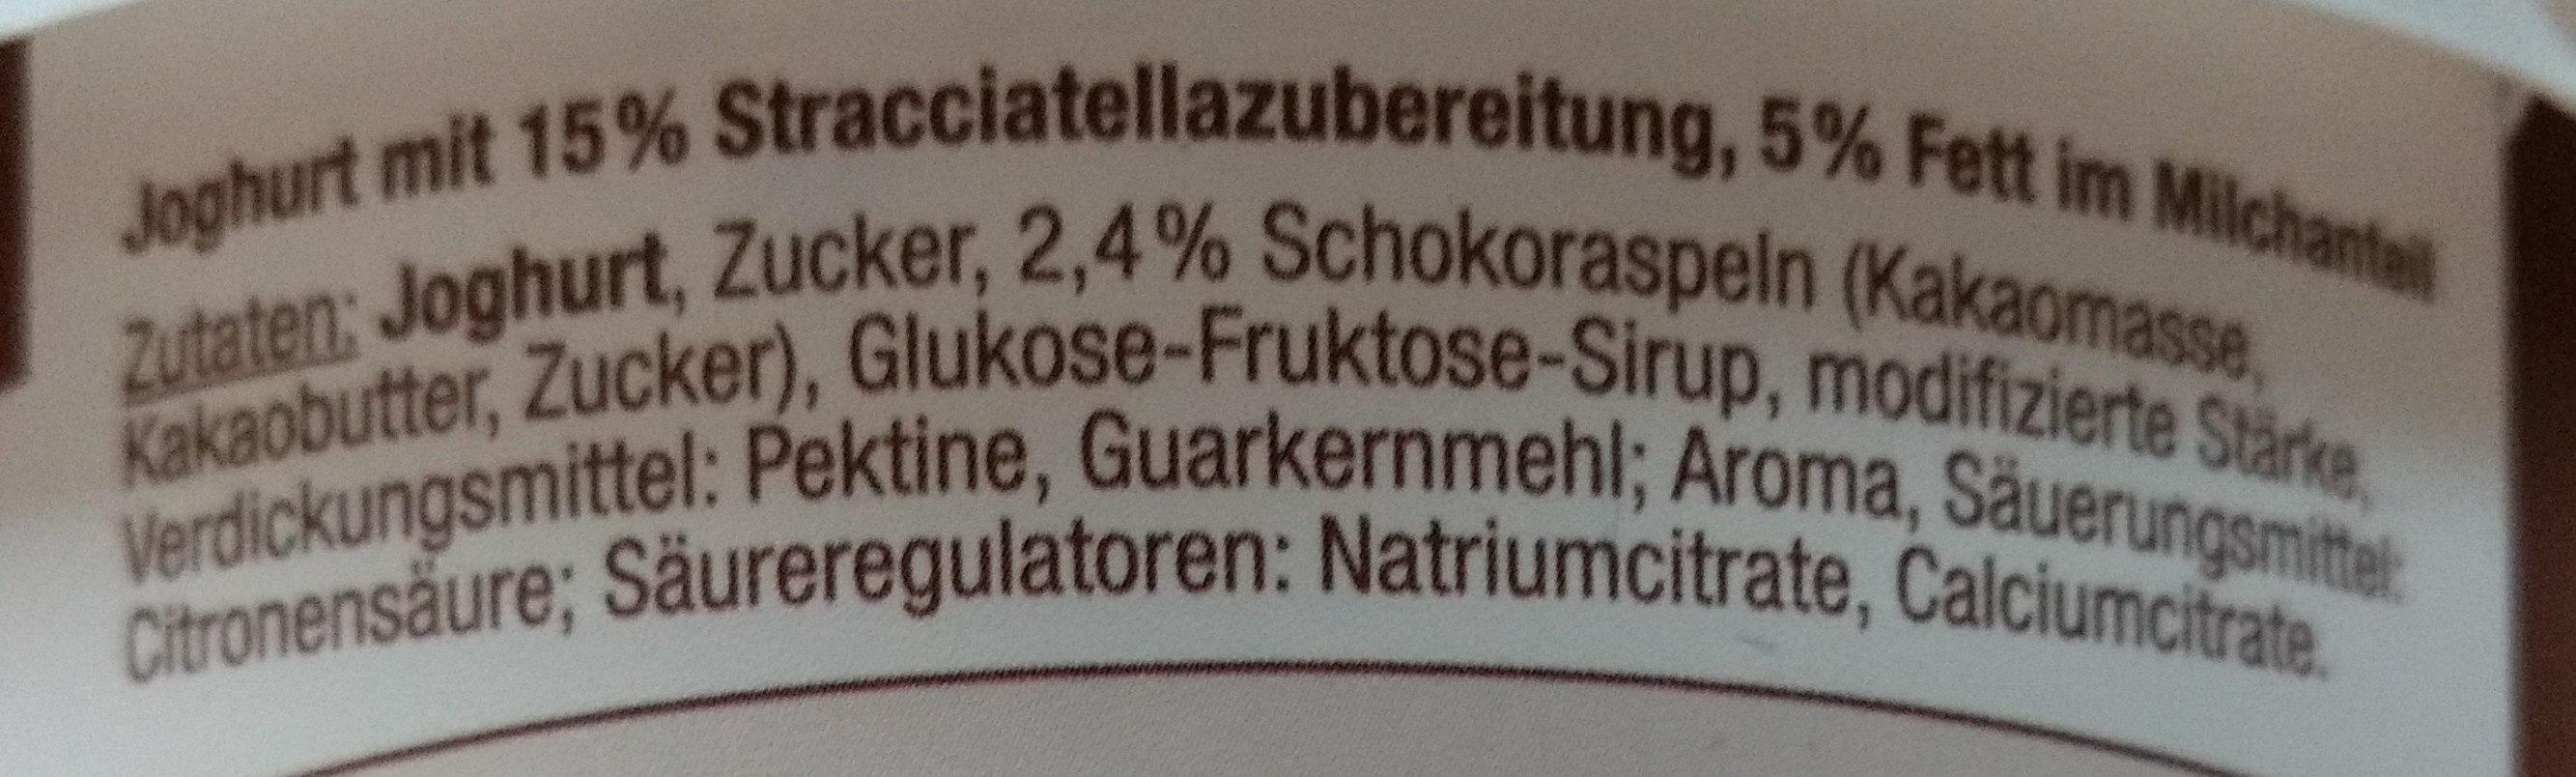 Cremiger Joghurt Stracciatella Gutes Land - Ingredients - de